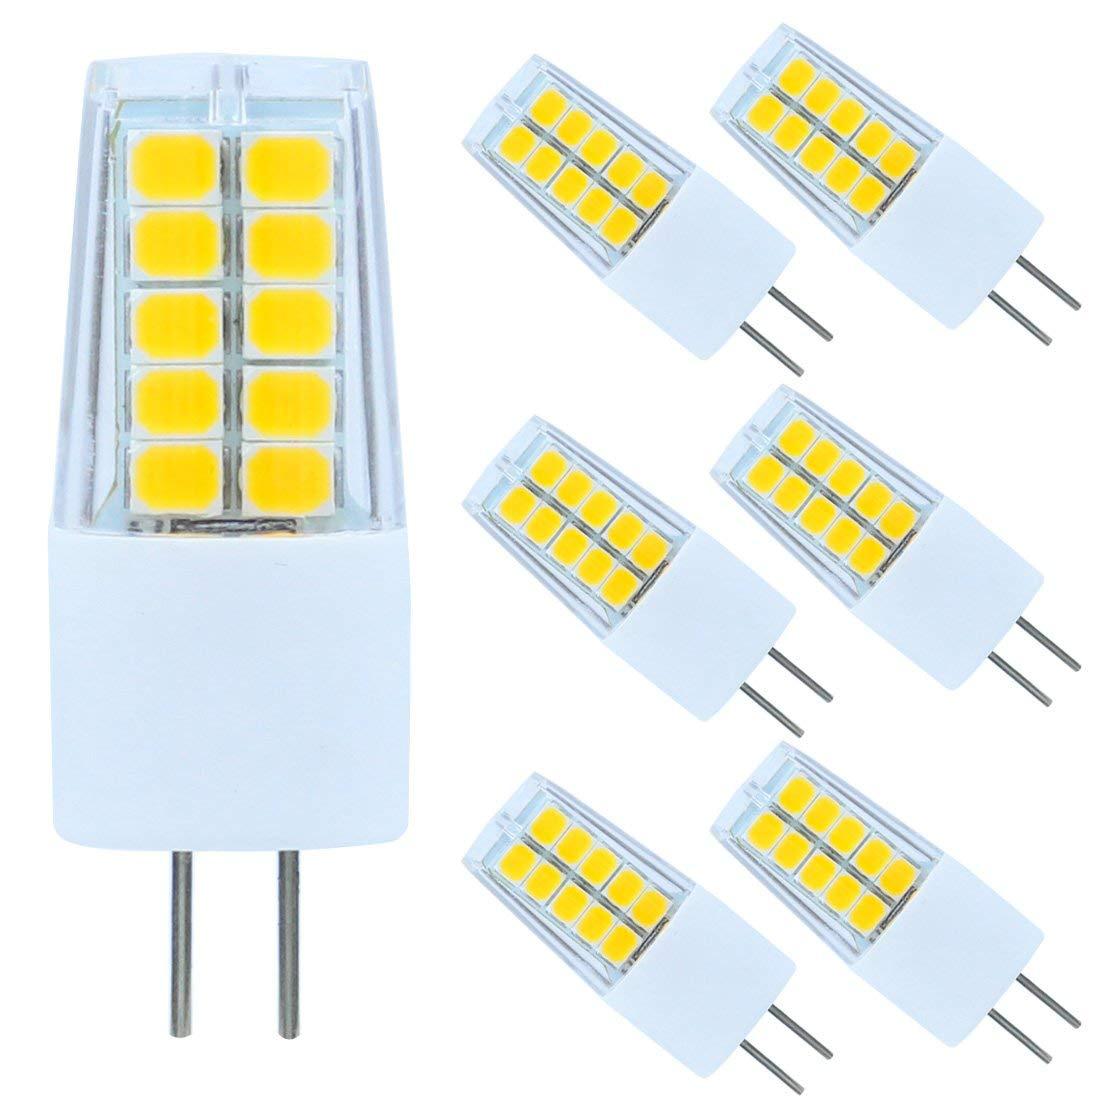 Reelco LED G4 Bulb Bi-Pin Base T3 Bulbs AC/DC 12V 3Watt 2700K-3000K Warm White Light Bulb 20W-30Watt Halogen Replacement (6-Pack)